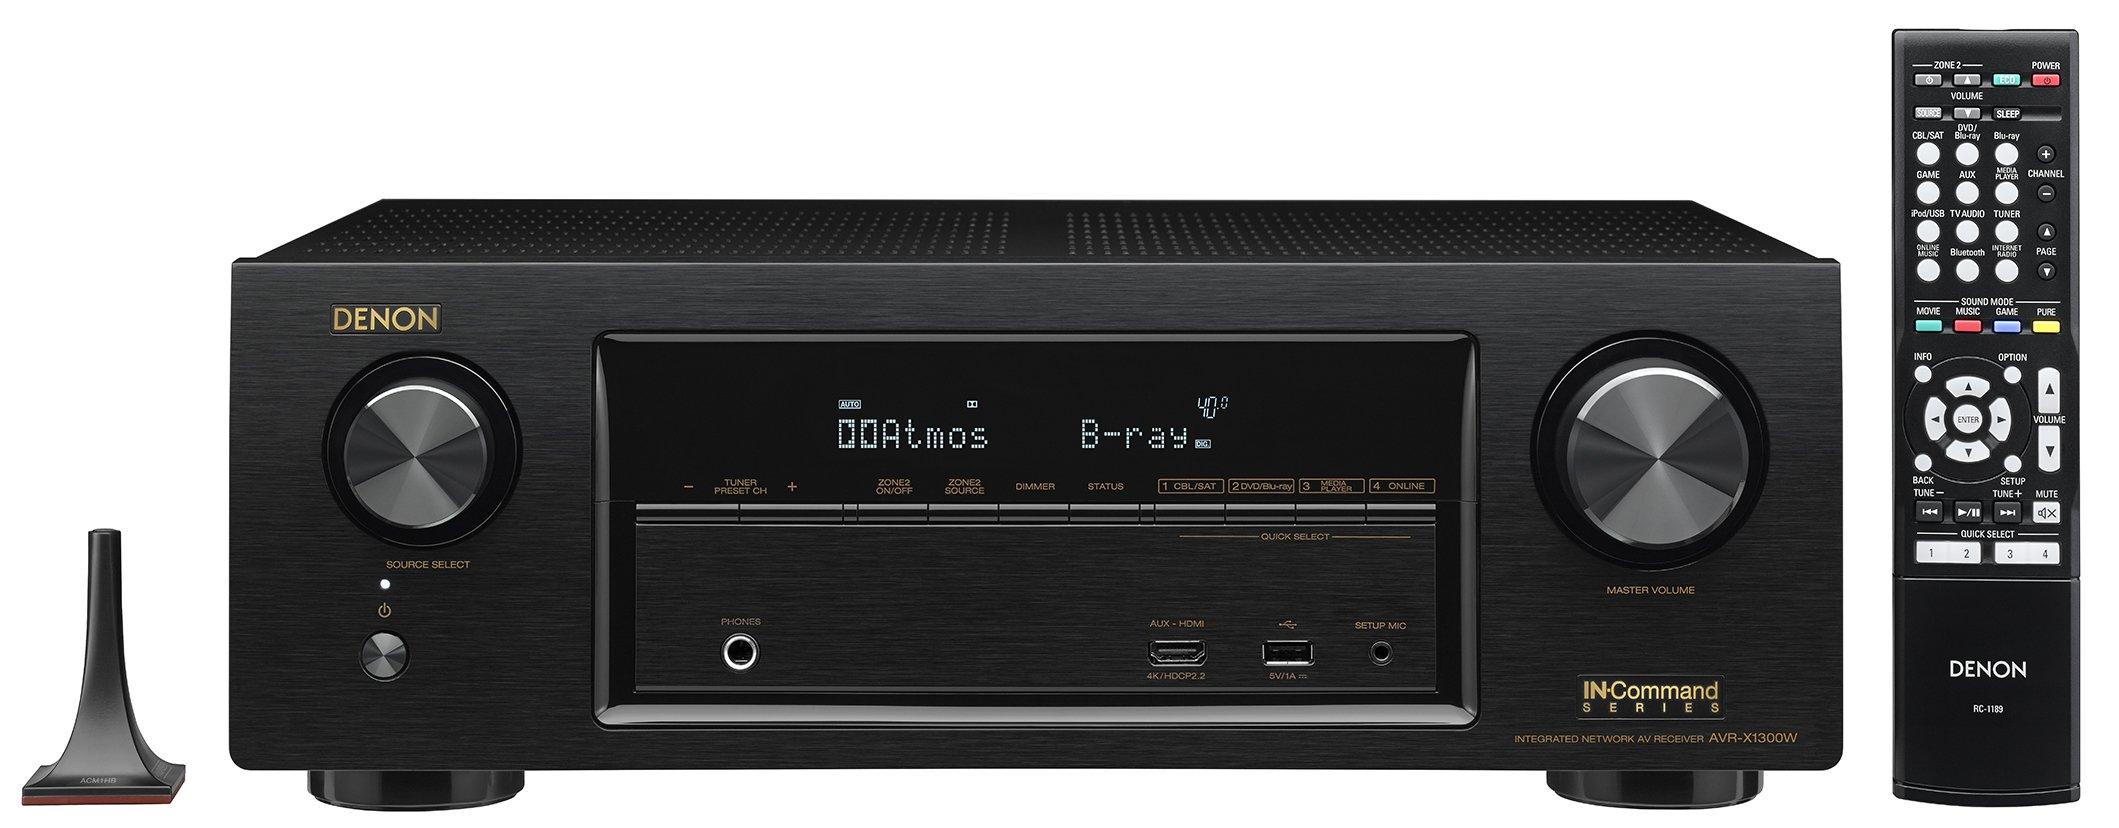 Denon AVR-X1300W 7.2 Channel Full 4K Ultra HD AV Receiver with Bluetooth by Denon